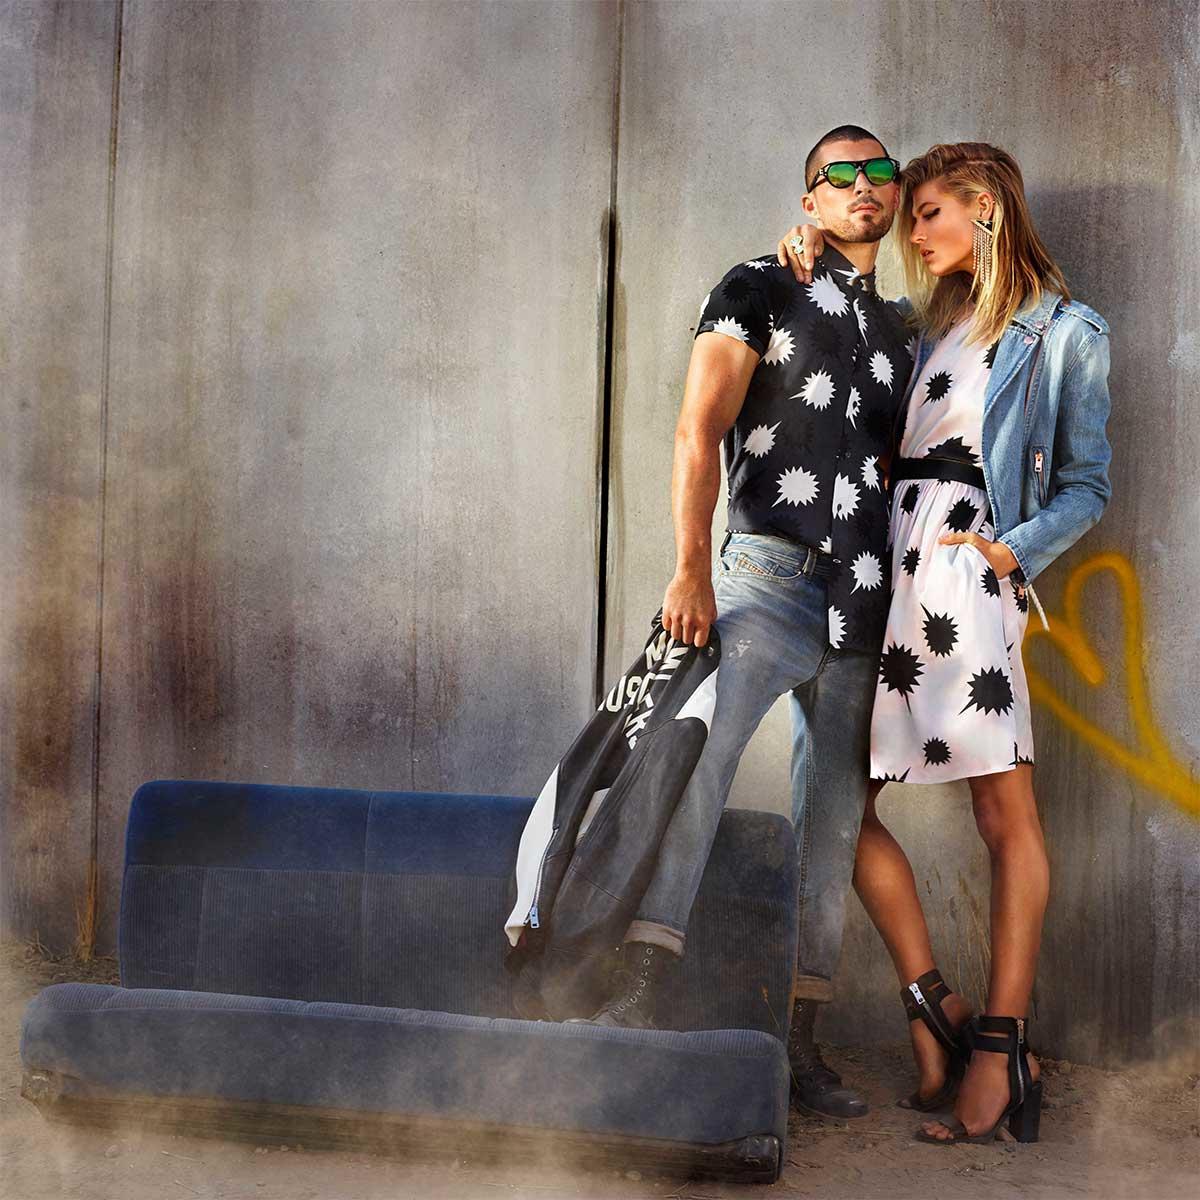 Throwback fashion, straight from 1980's #America. #MakeLoveNotWallas #Diesel #SS17   https://t.co/aSIldu9cUo https://t.co/1t5DEZ6P0c